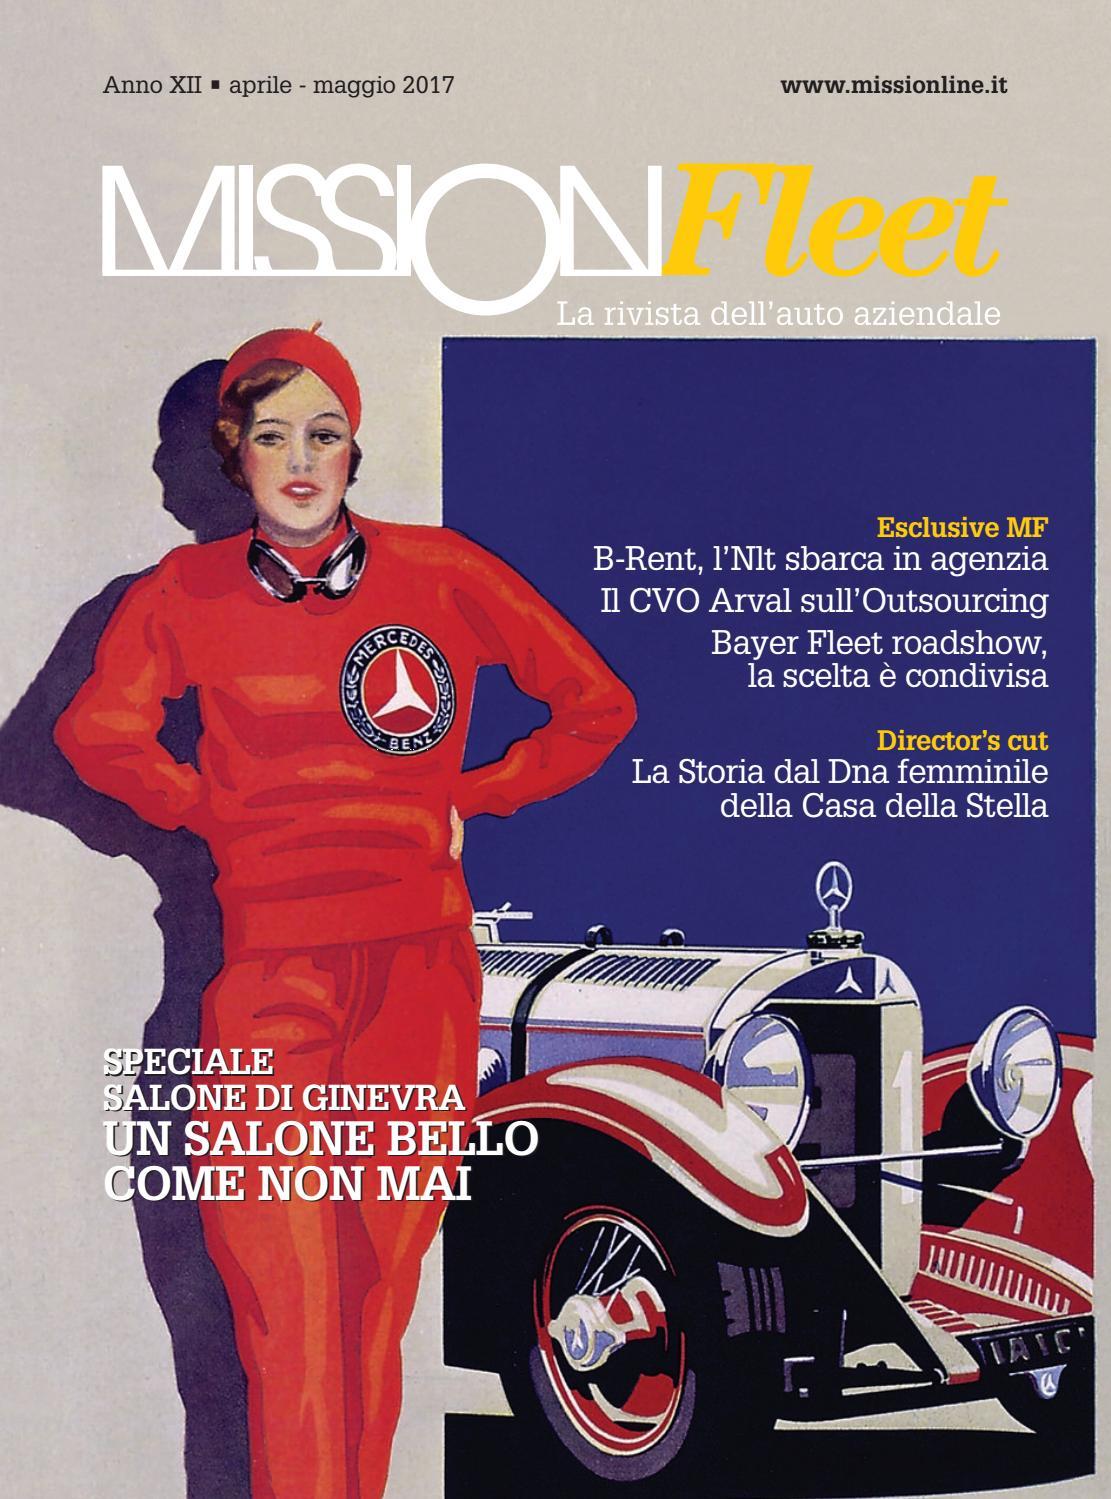 Missionfleet 2 - 2017 by Newsteca - issuu 2bcd4547213